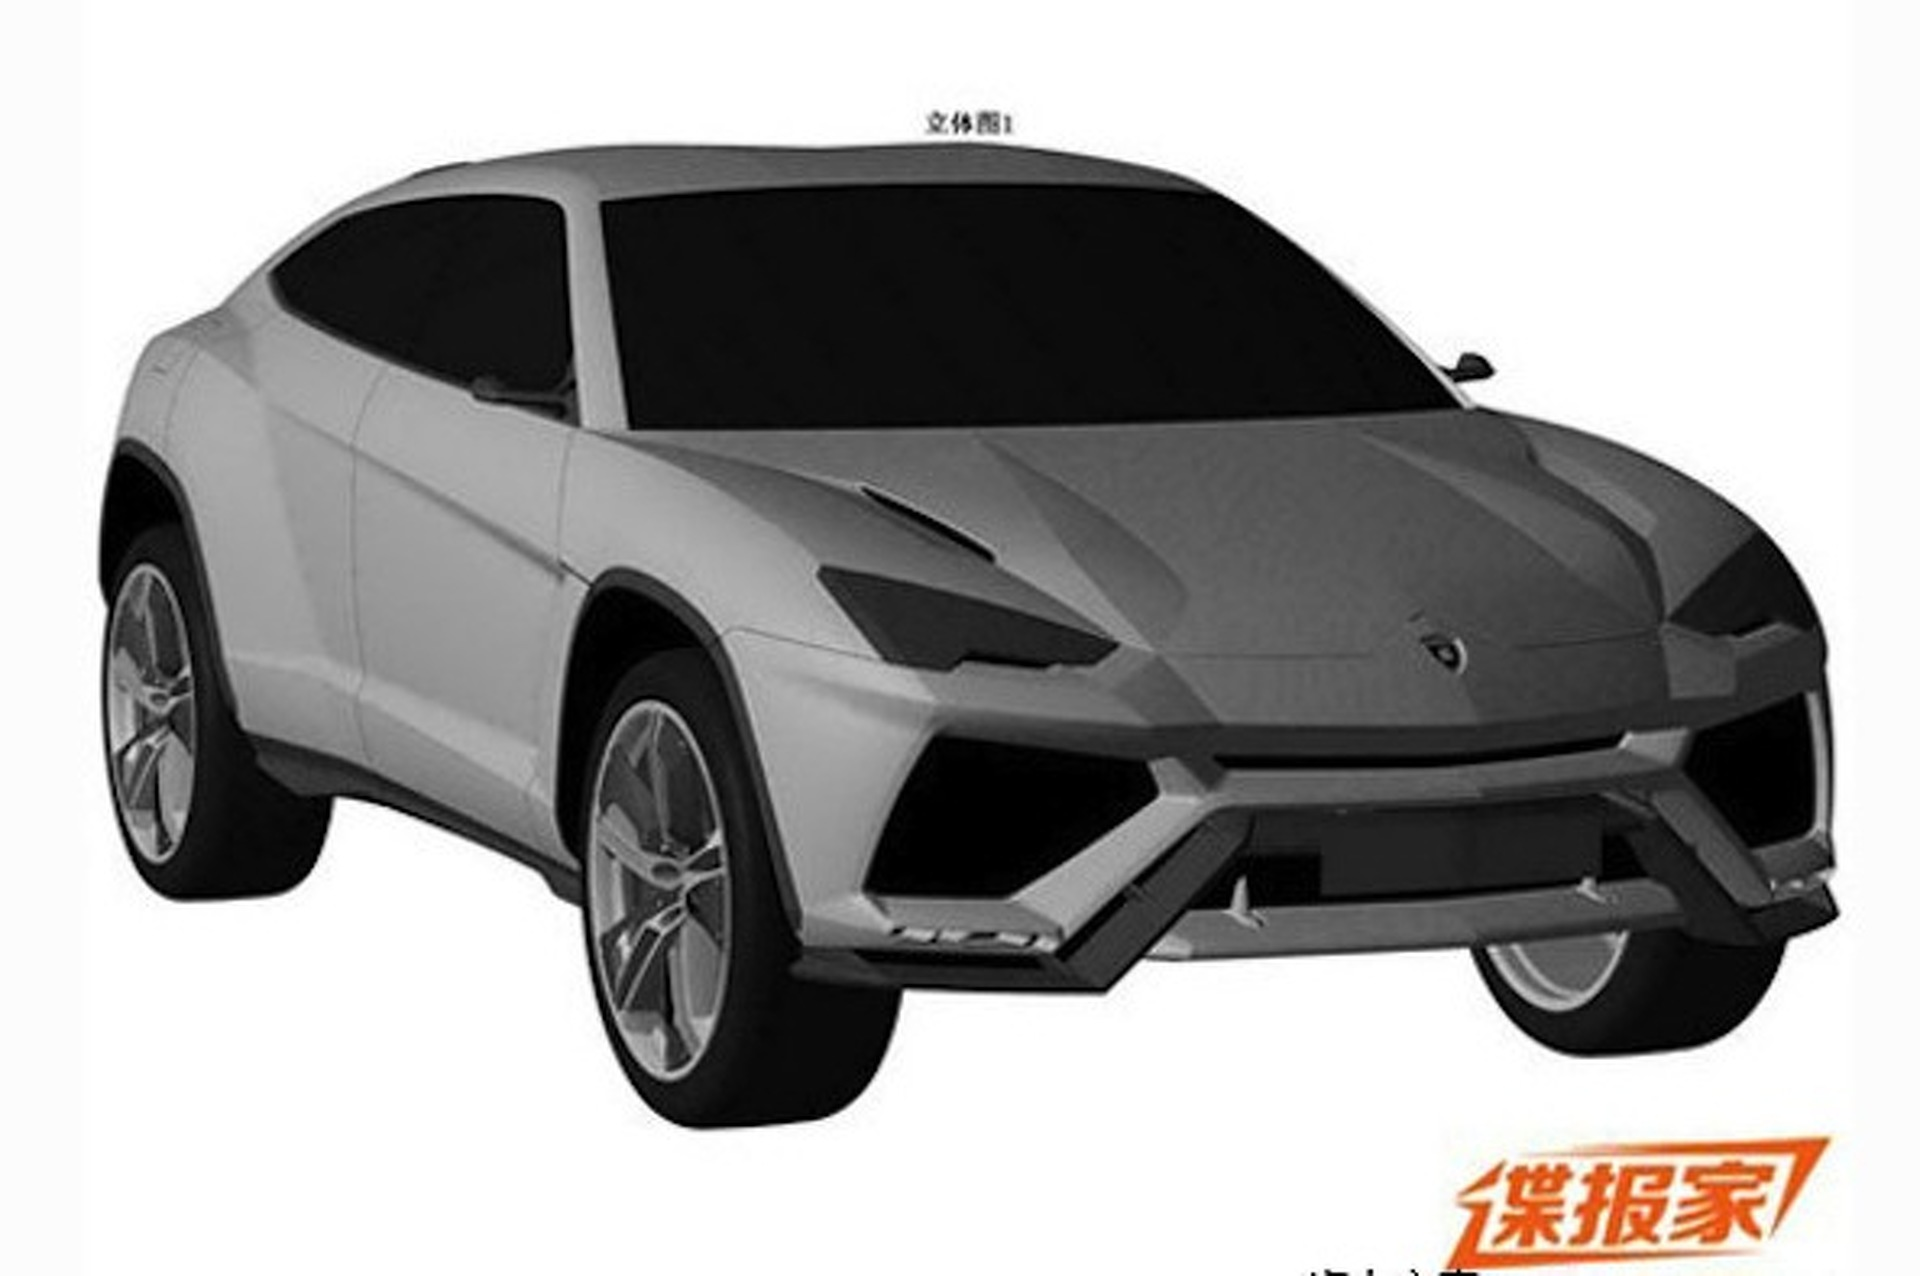 New Lamborghini Patent Filings Could Put Urus SUV Closer to Production